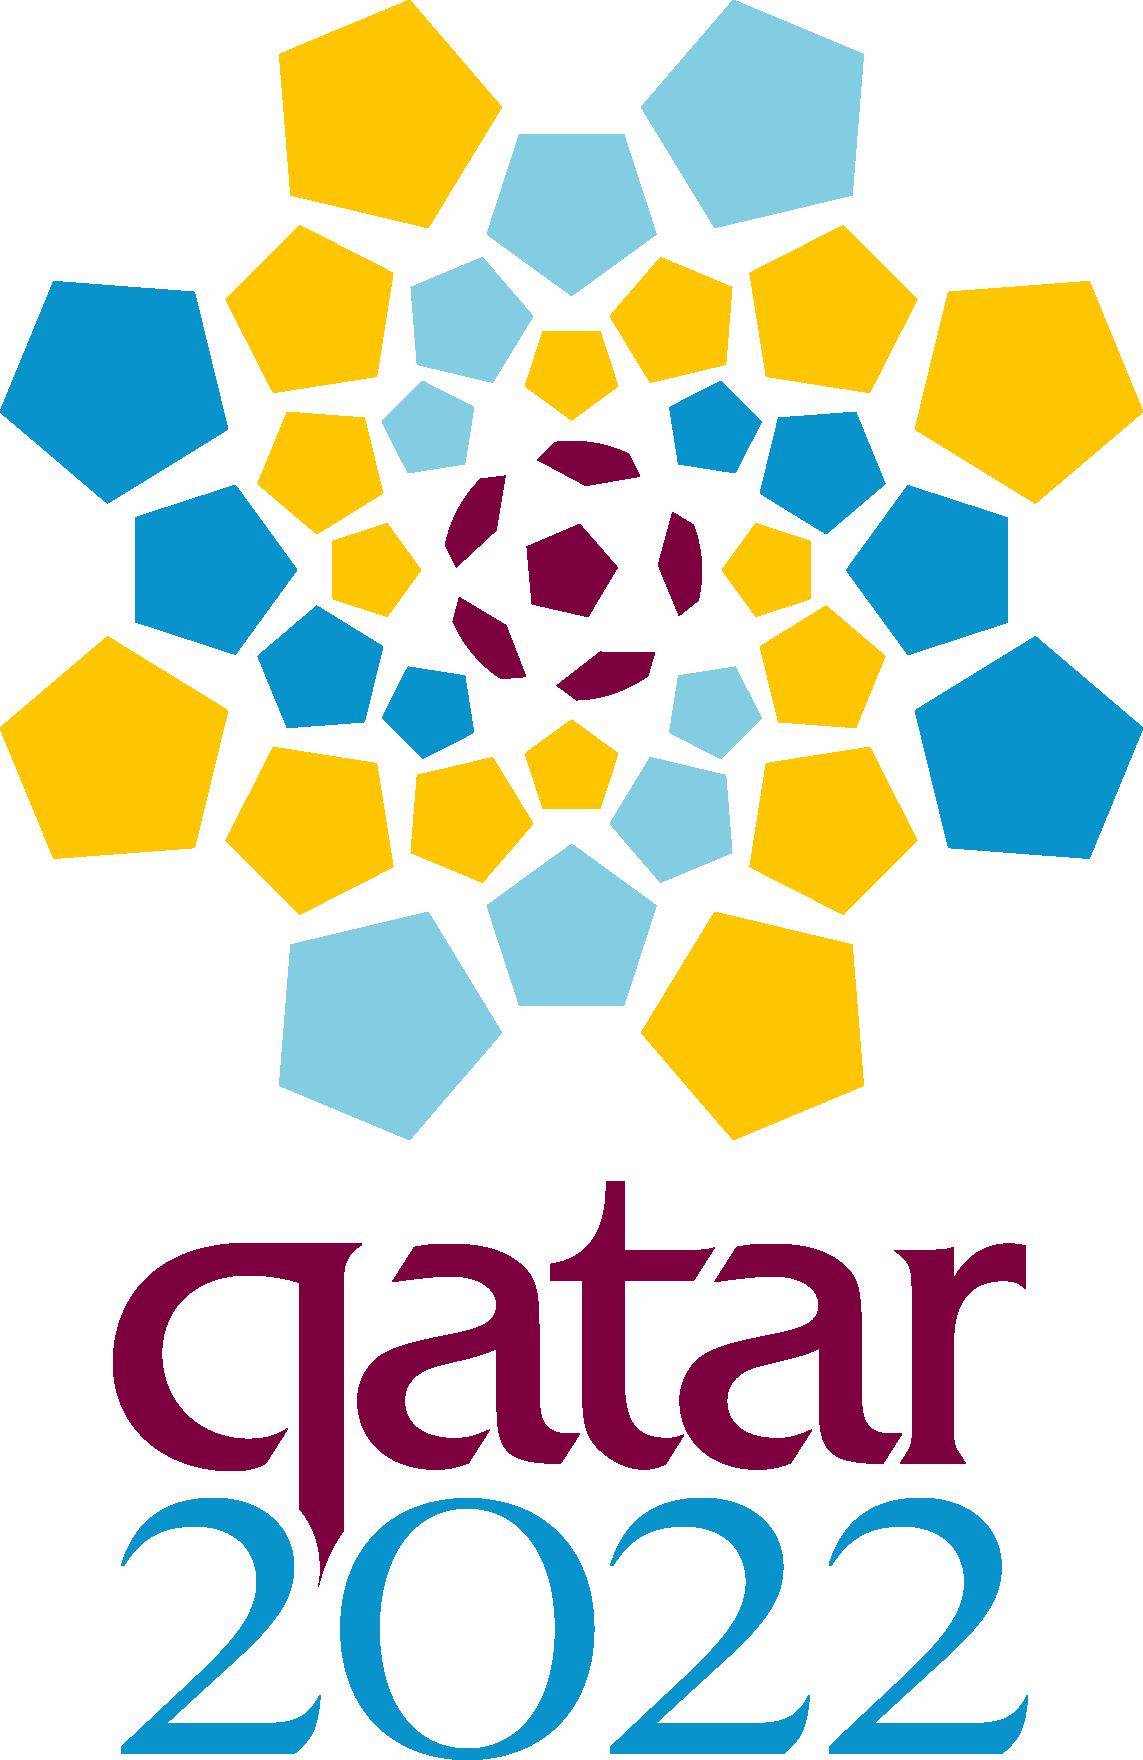 Qatar 2022 Logo Fifa World Cup World Cup 2022 2022 Fifa World Cup World Cup